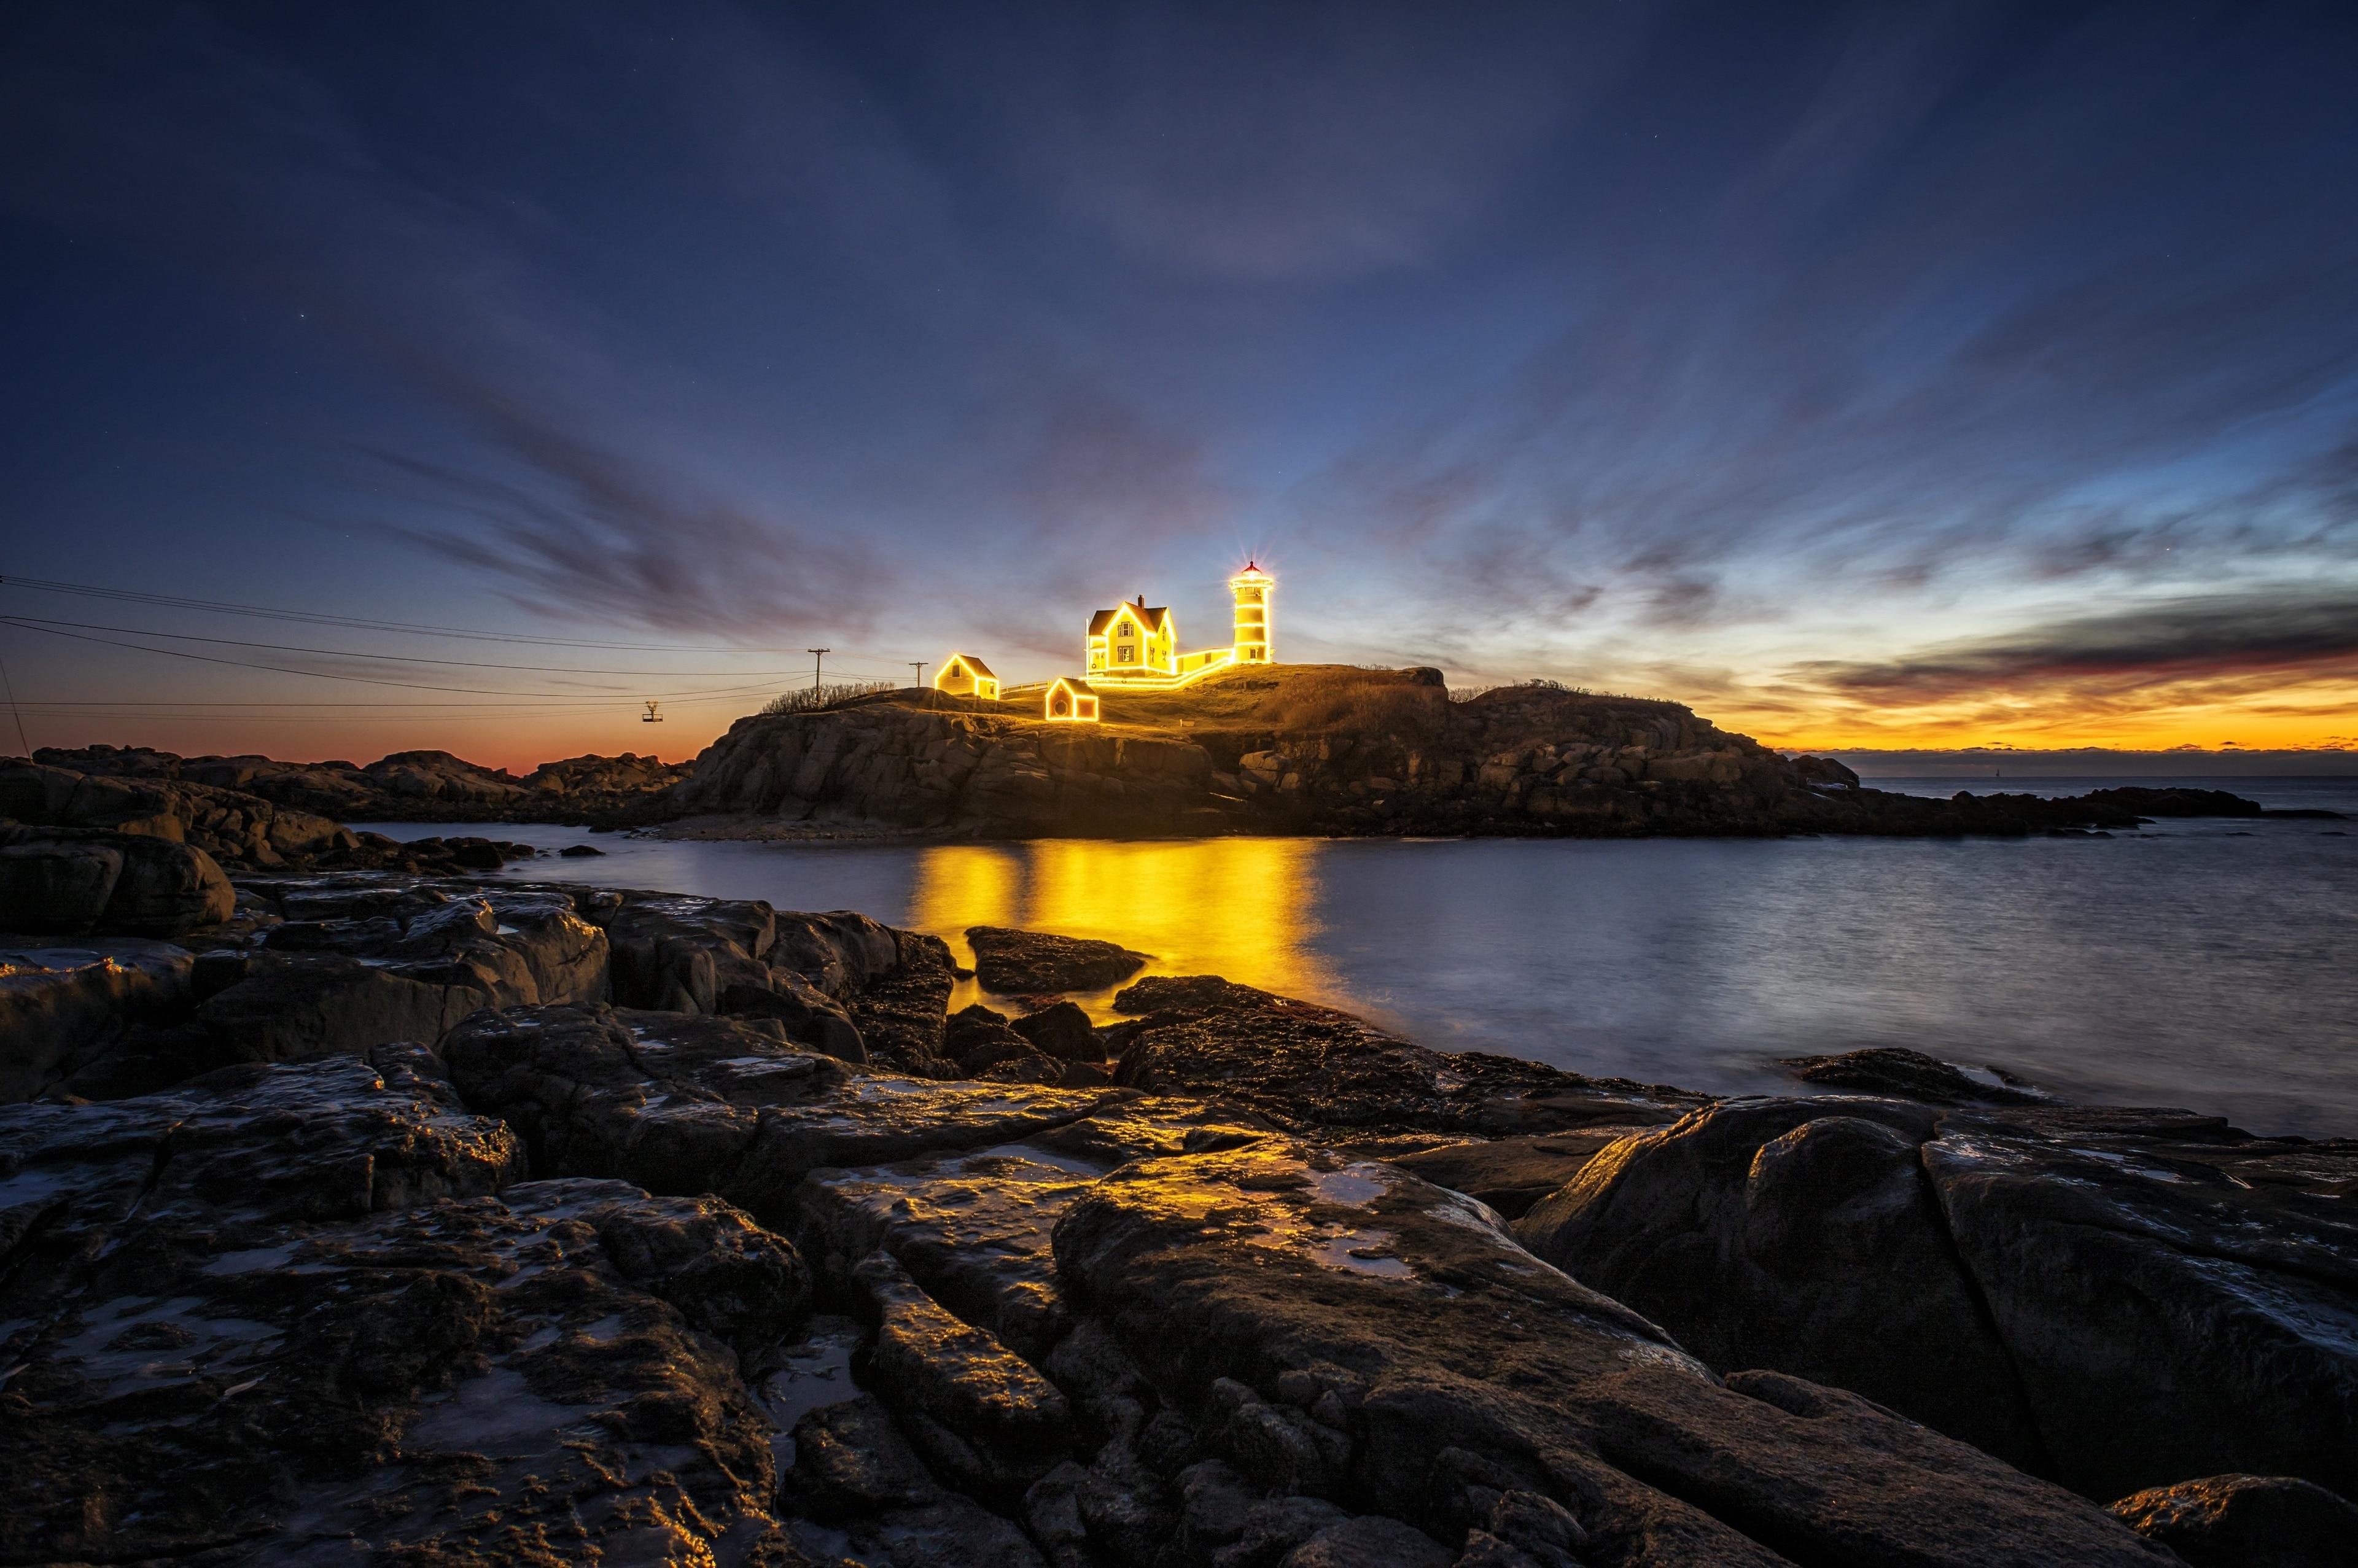 Nubble Lighthouse, York Beach, Maine, United States of America